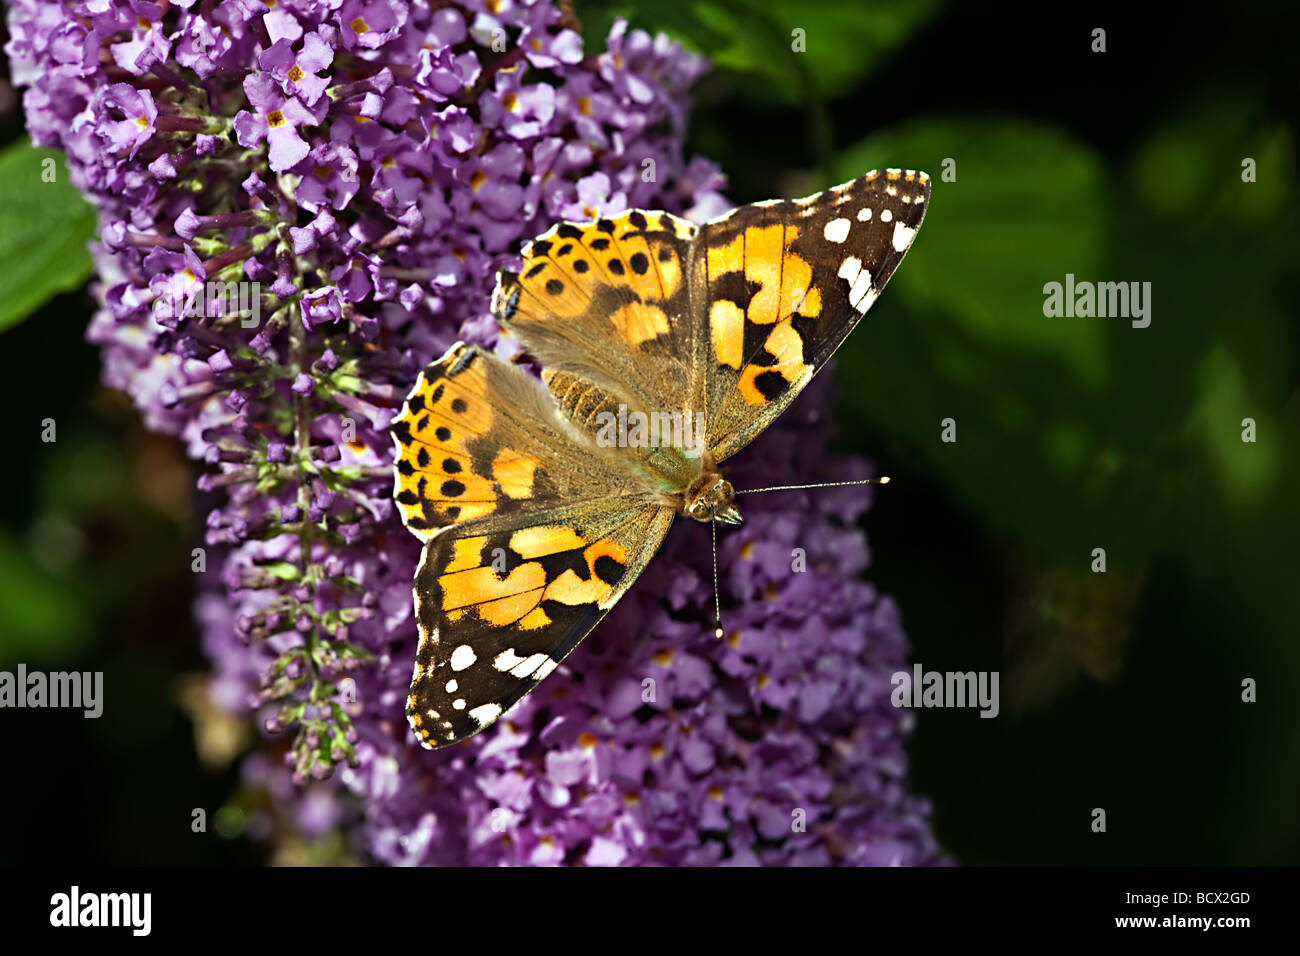 PAINTED LADY BUTTERFLY (Vanessa cardui) on Buddleia (Buddleia davidii) - Stock Image